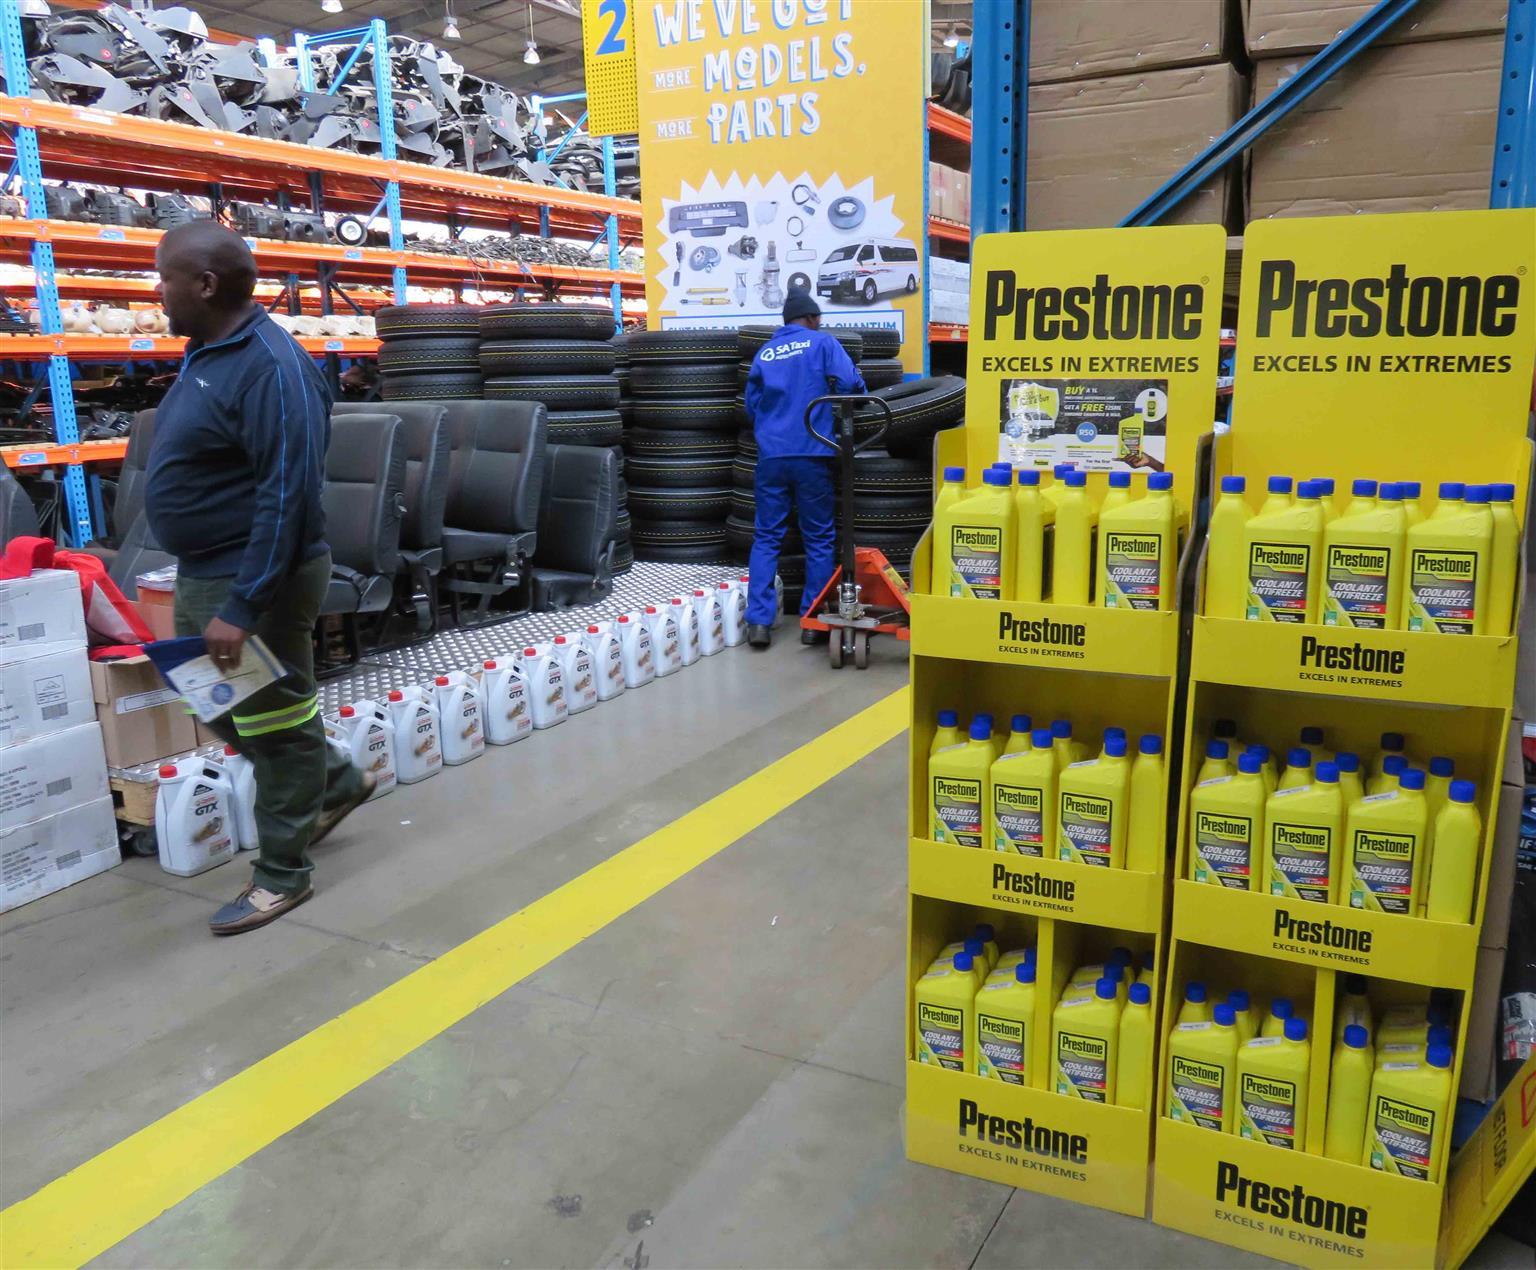 Prestone Coolant / Antifreeze SPECIAL OFFER - Exclusive to SA Taxi Auto Parts